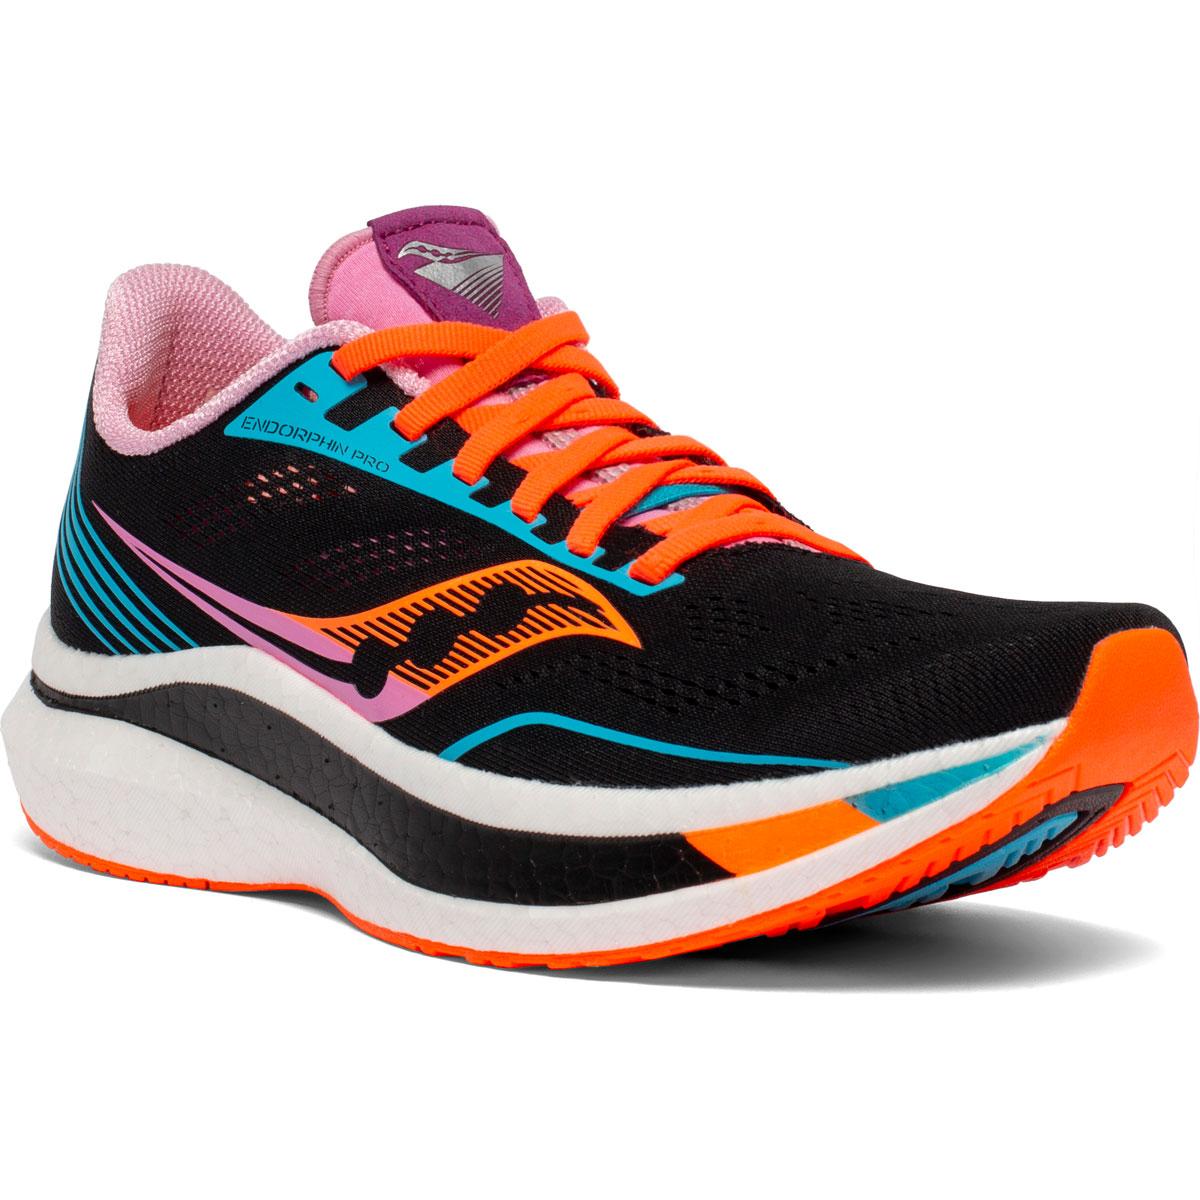 Women's Saucony Endorphin Pro Running Shoe - Color: Future/Black - Size: 5 - Width: Regular, Future/Black, large, image 5